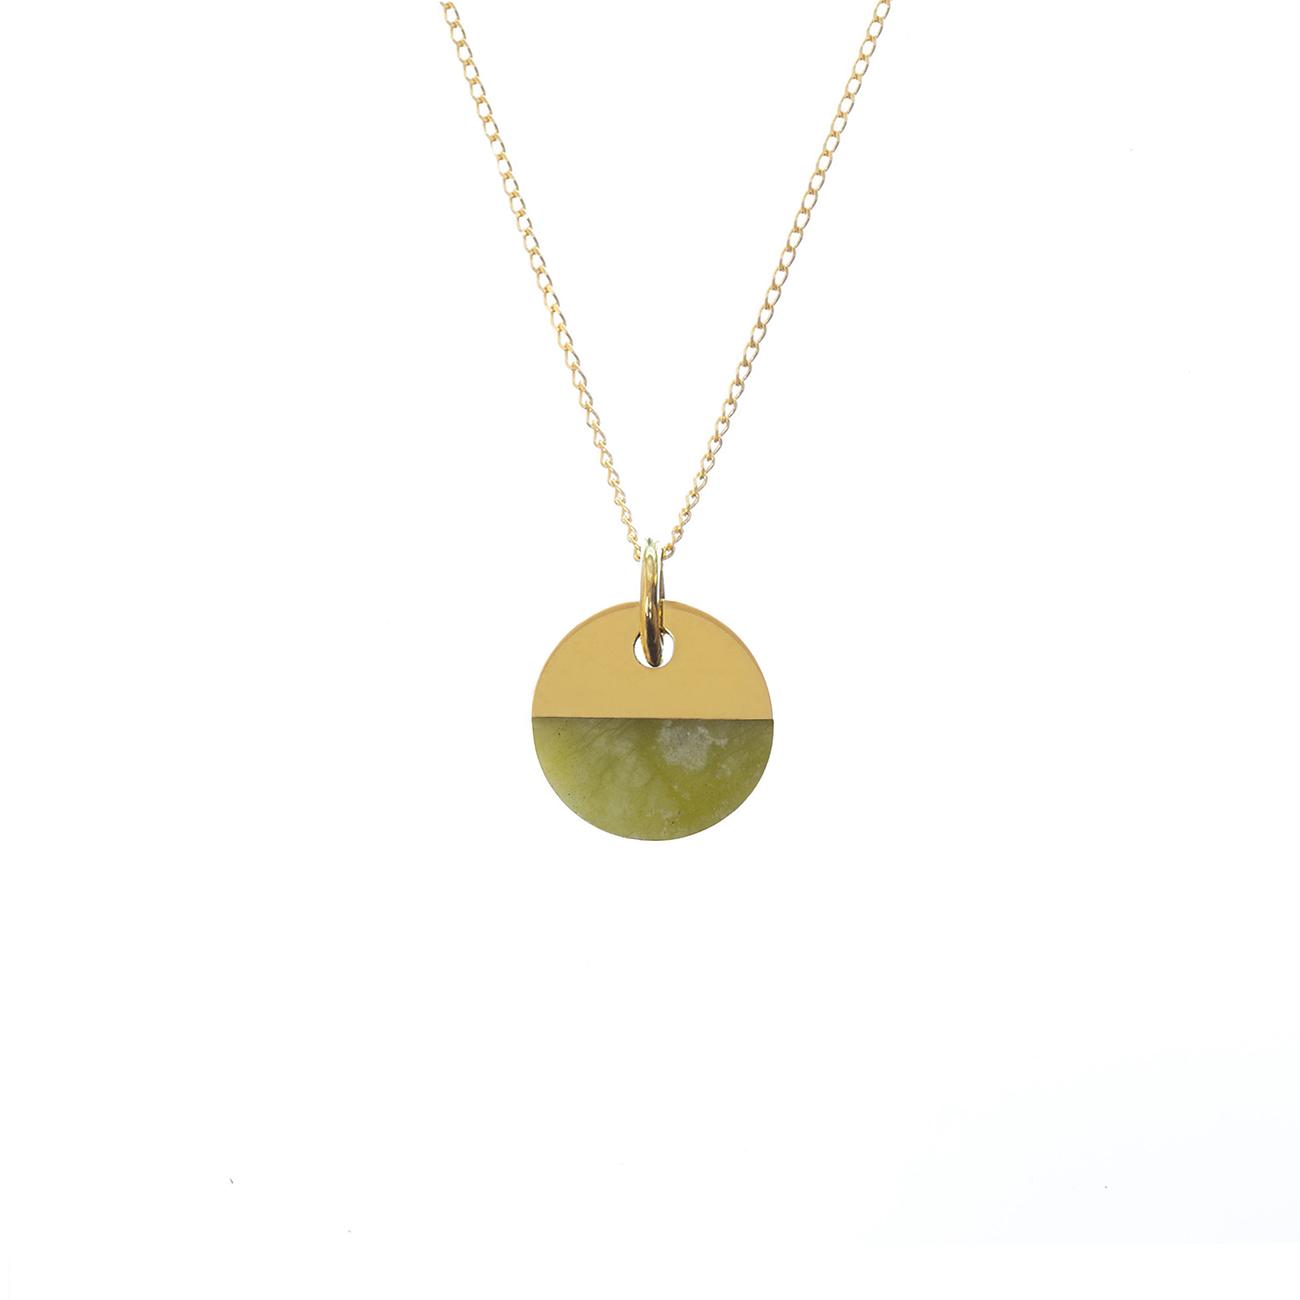 metaformi_design_jewelry_split_round_necklace_jade